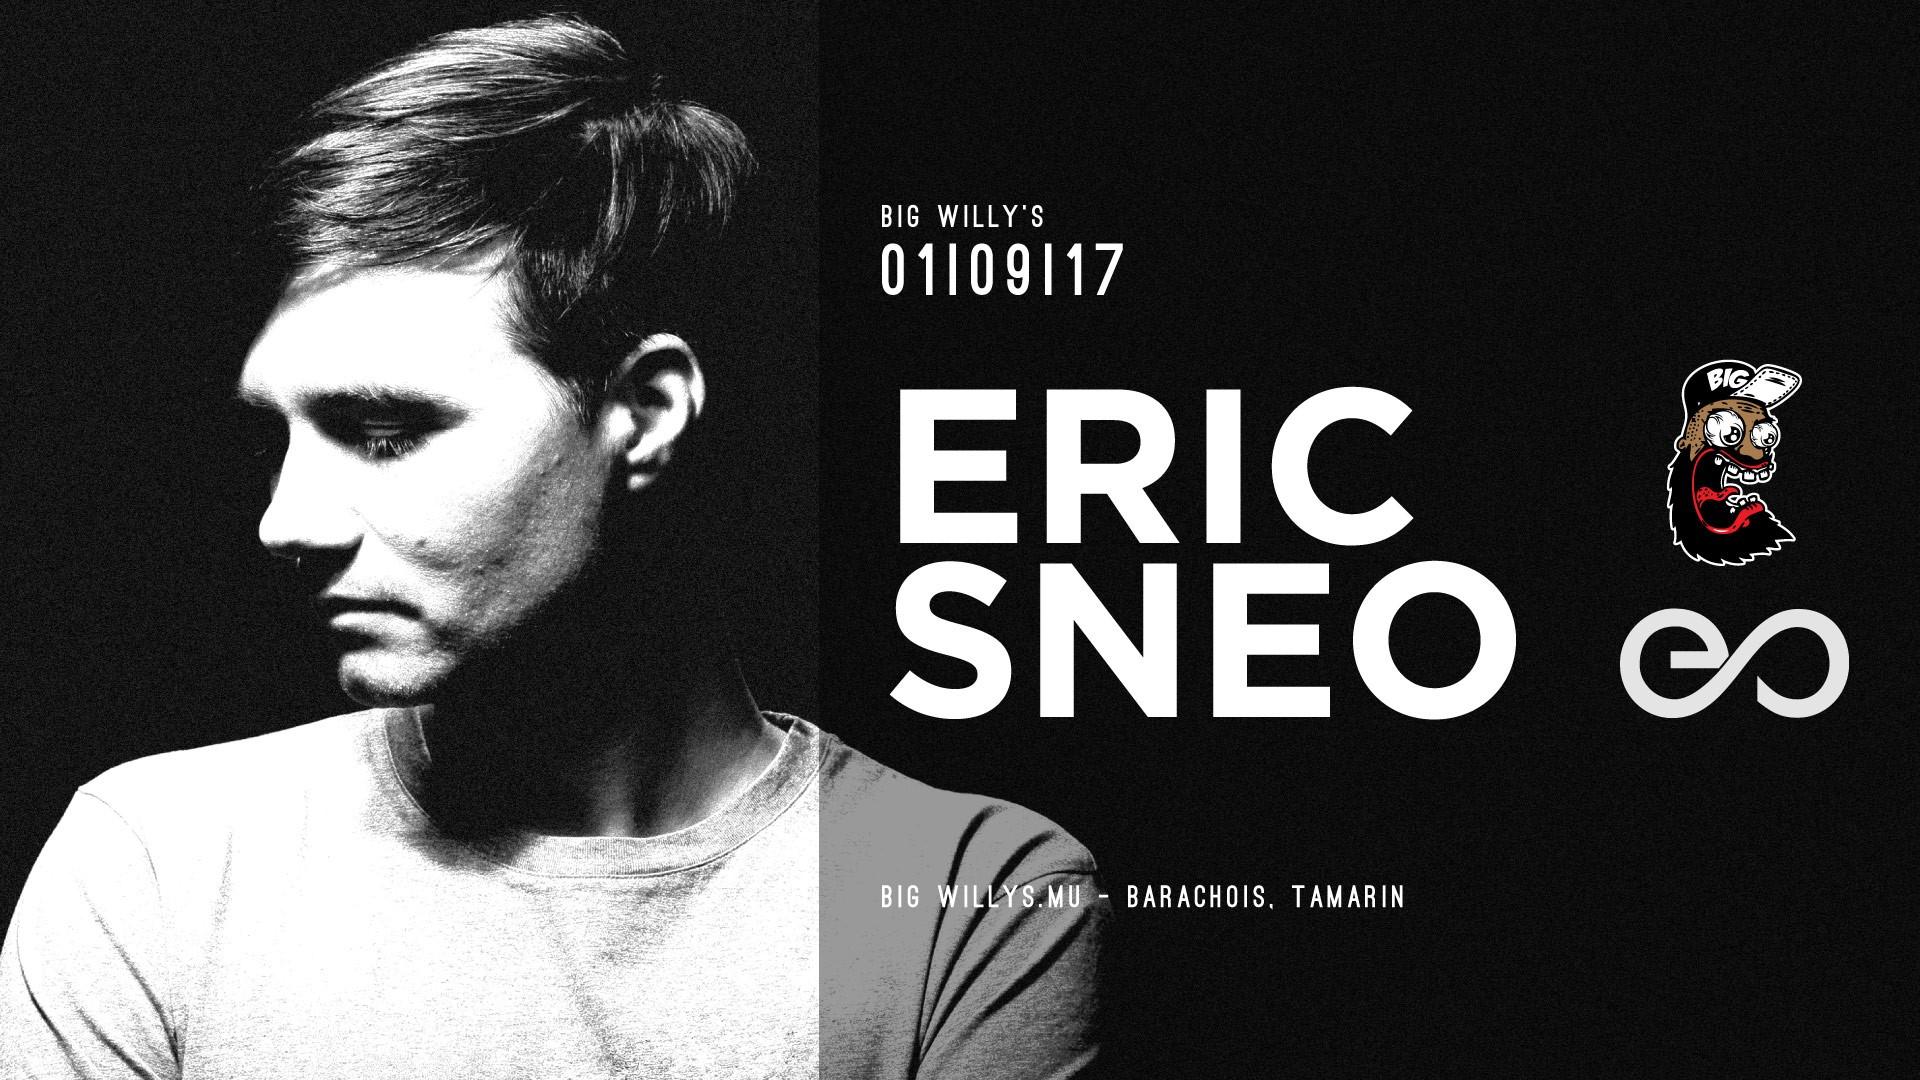 Eric Sneo 2